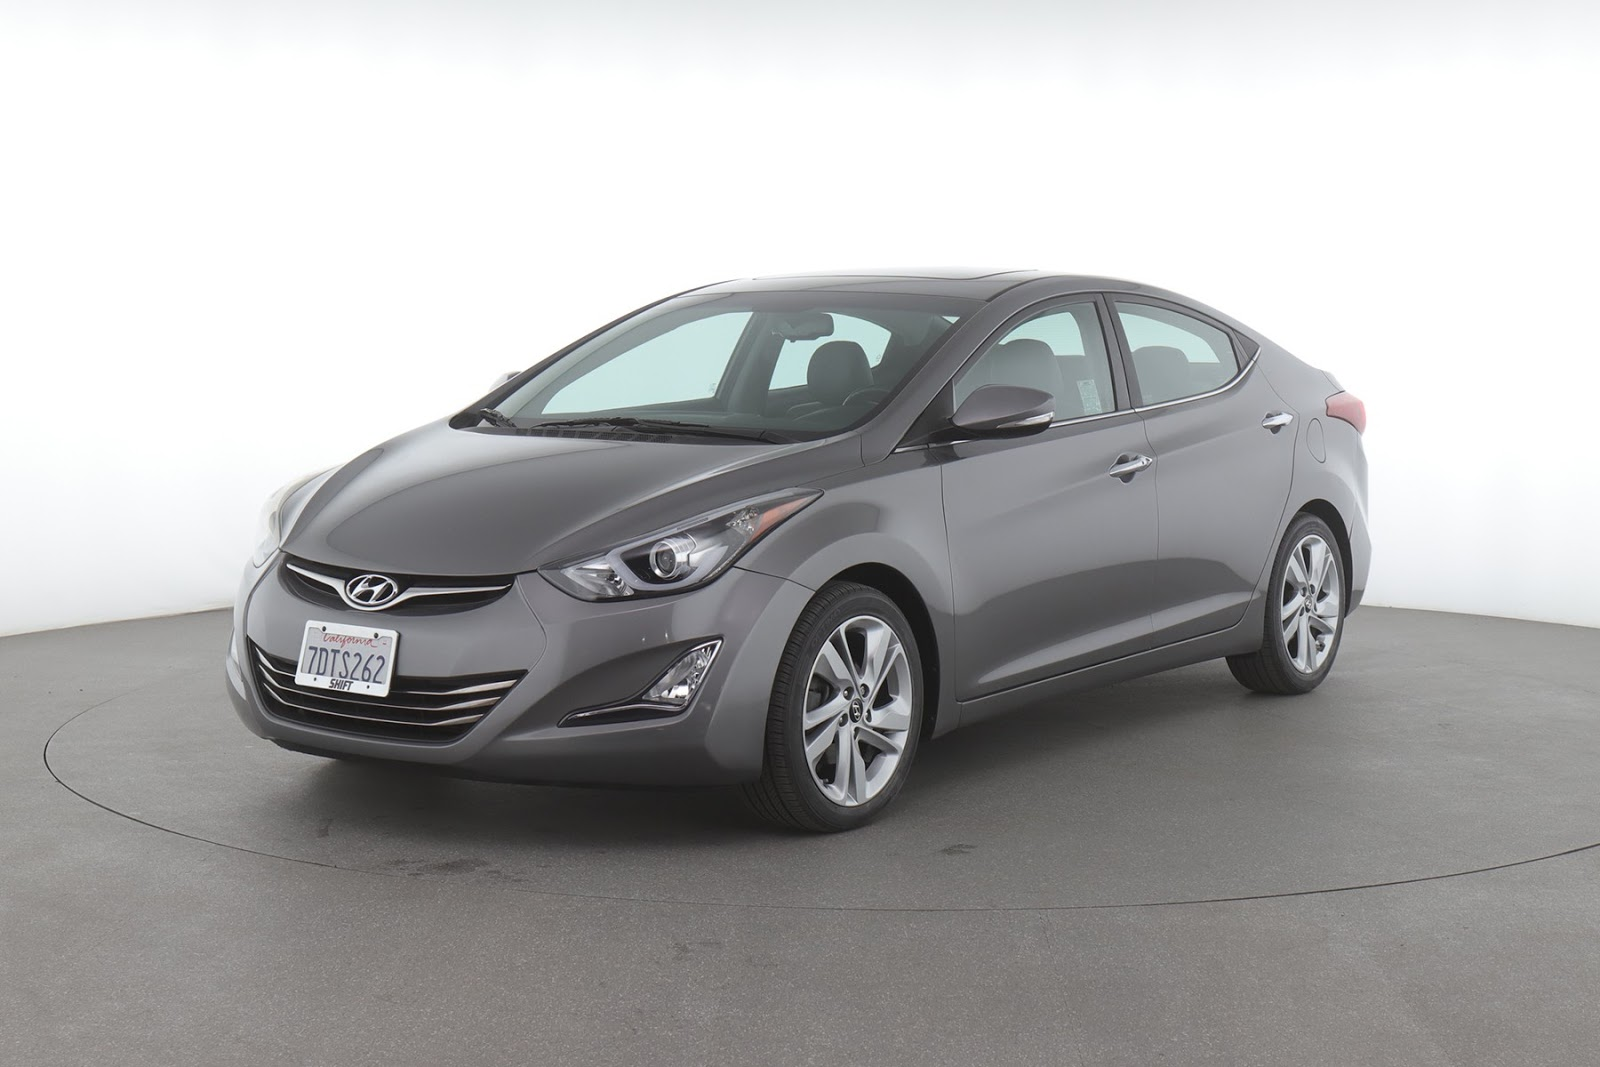 2014 Hyundai Elantra Limited (from $9,650)